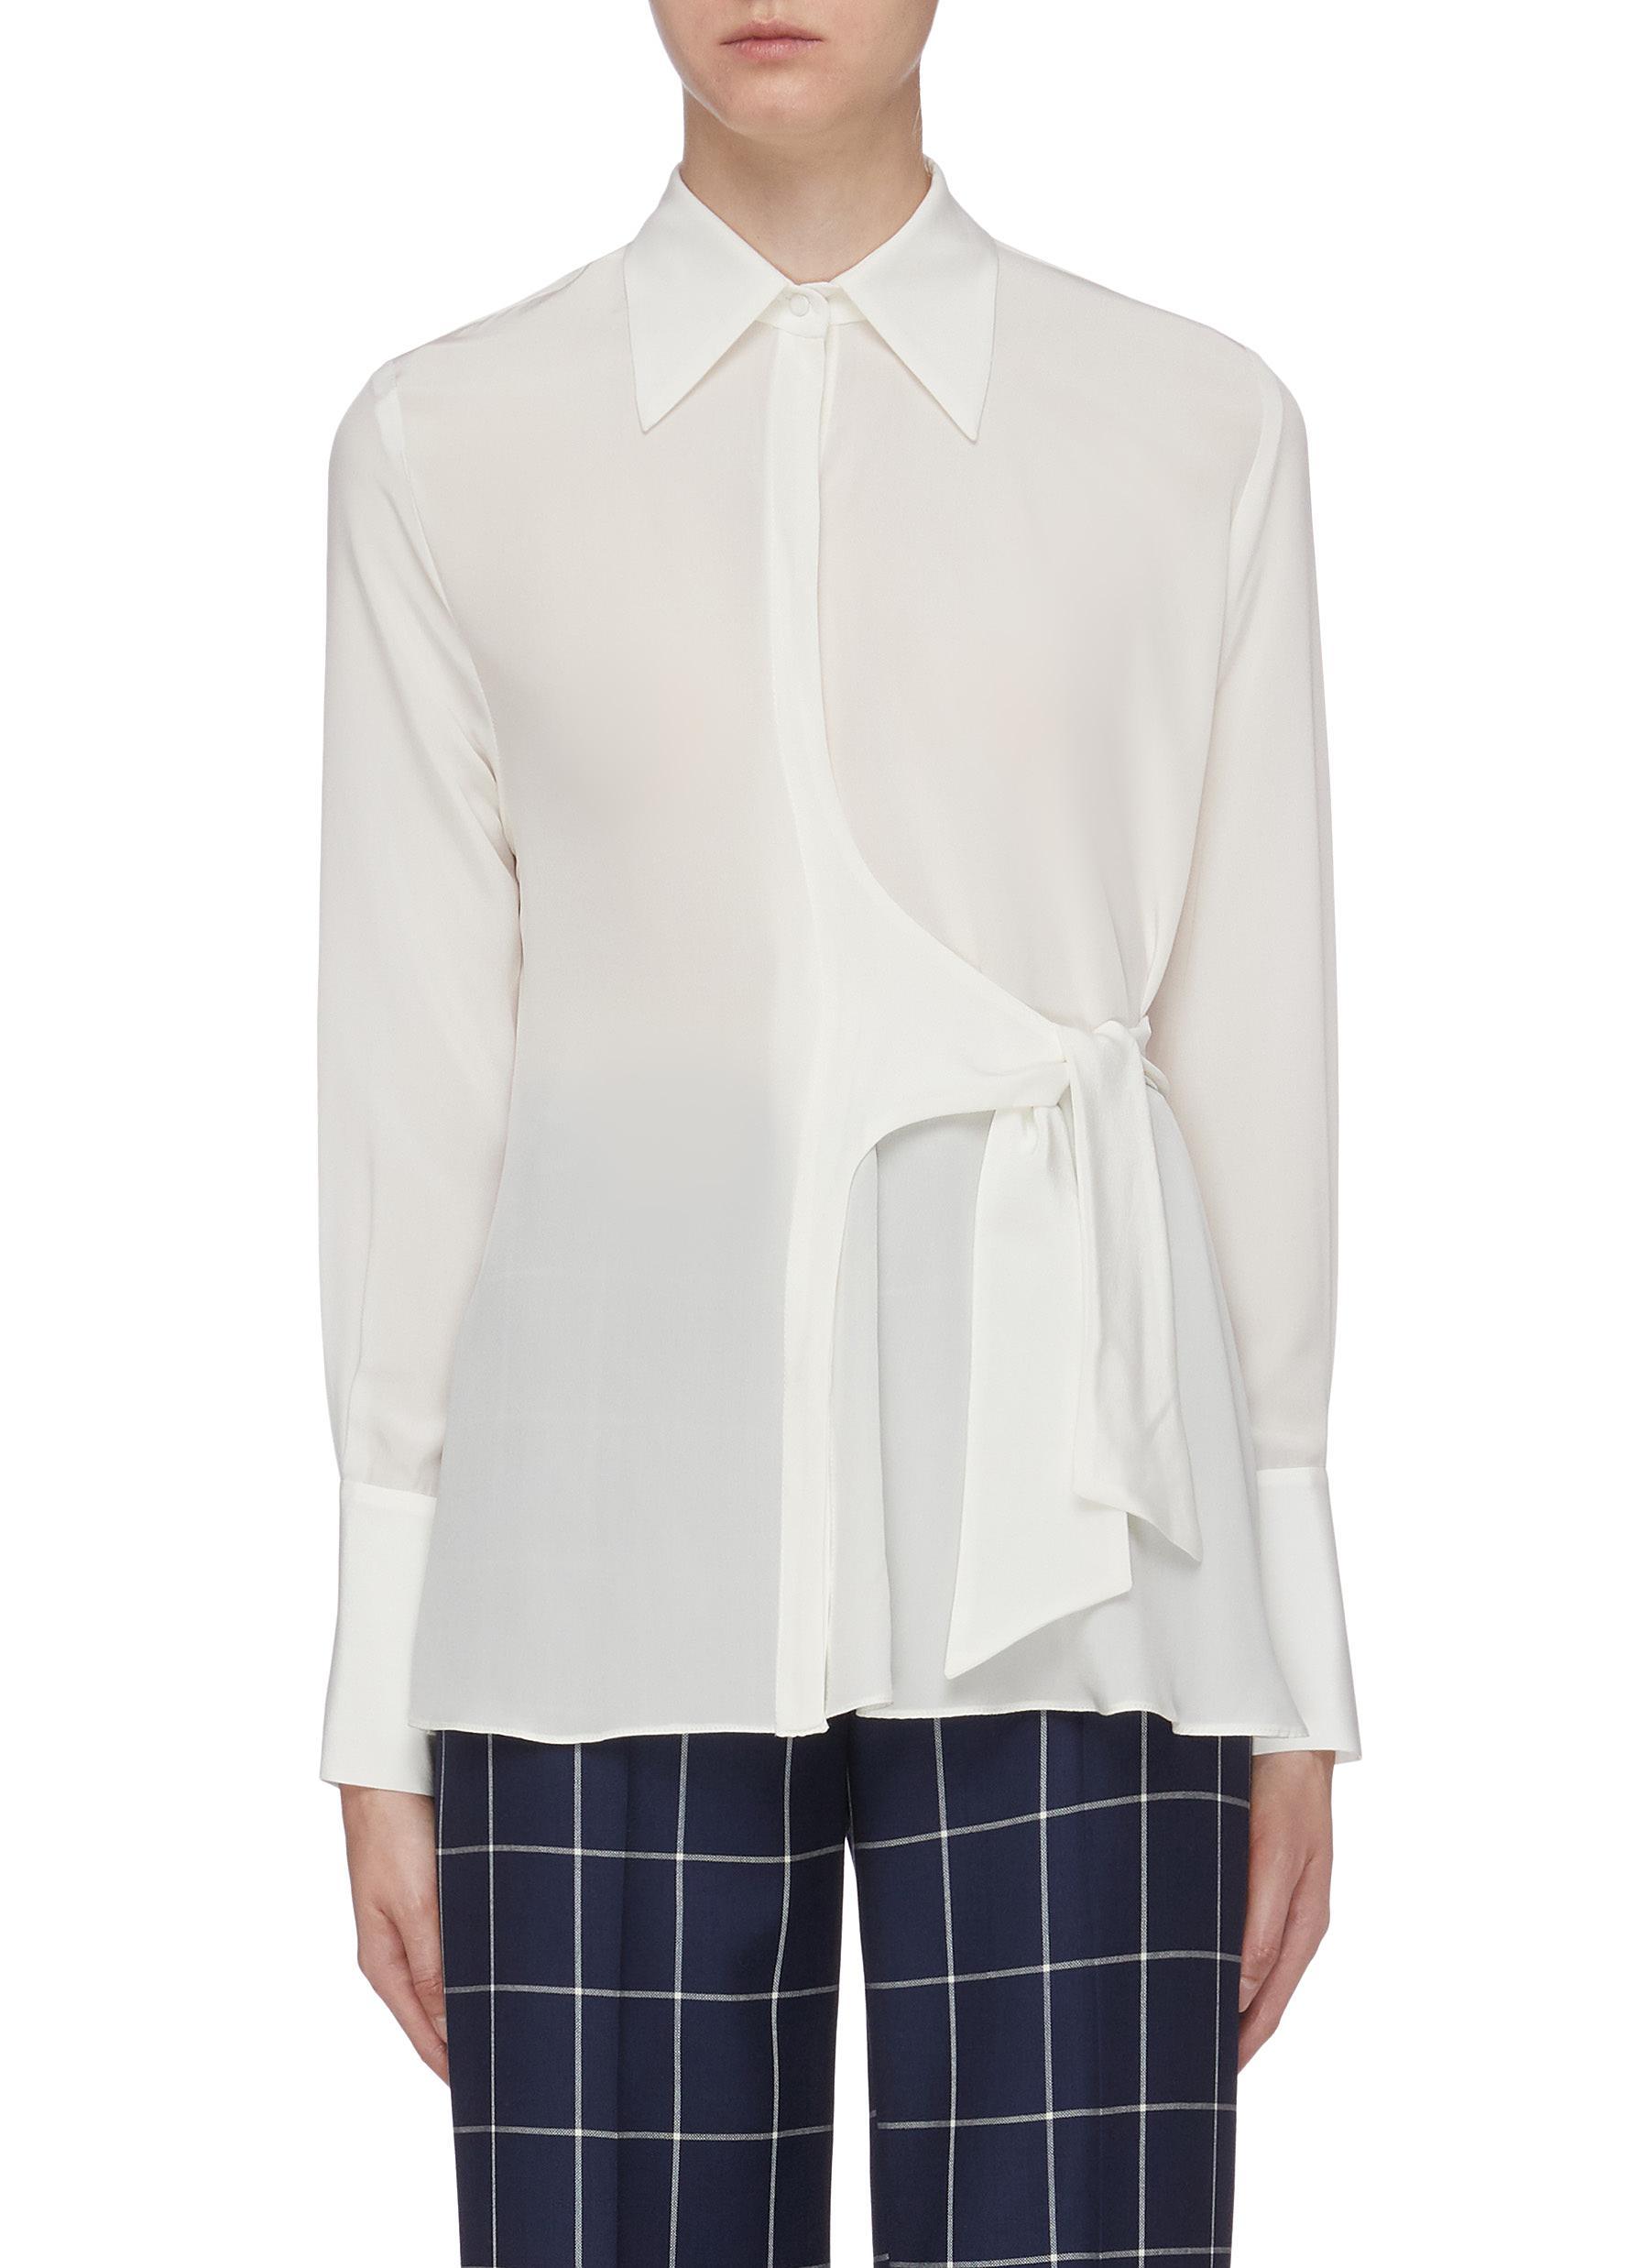 Tie side silk crepe shirt by Bianca Spender